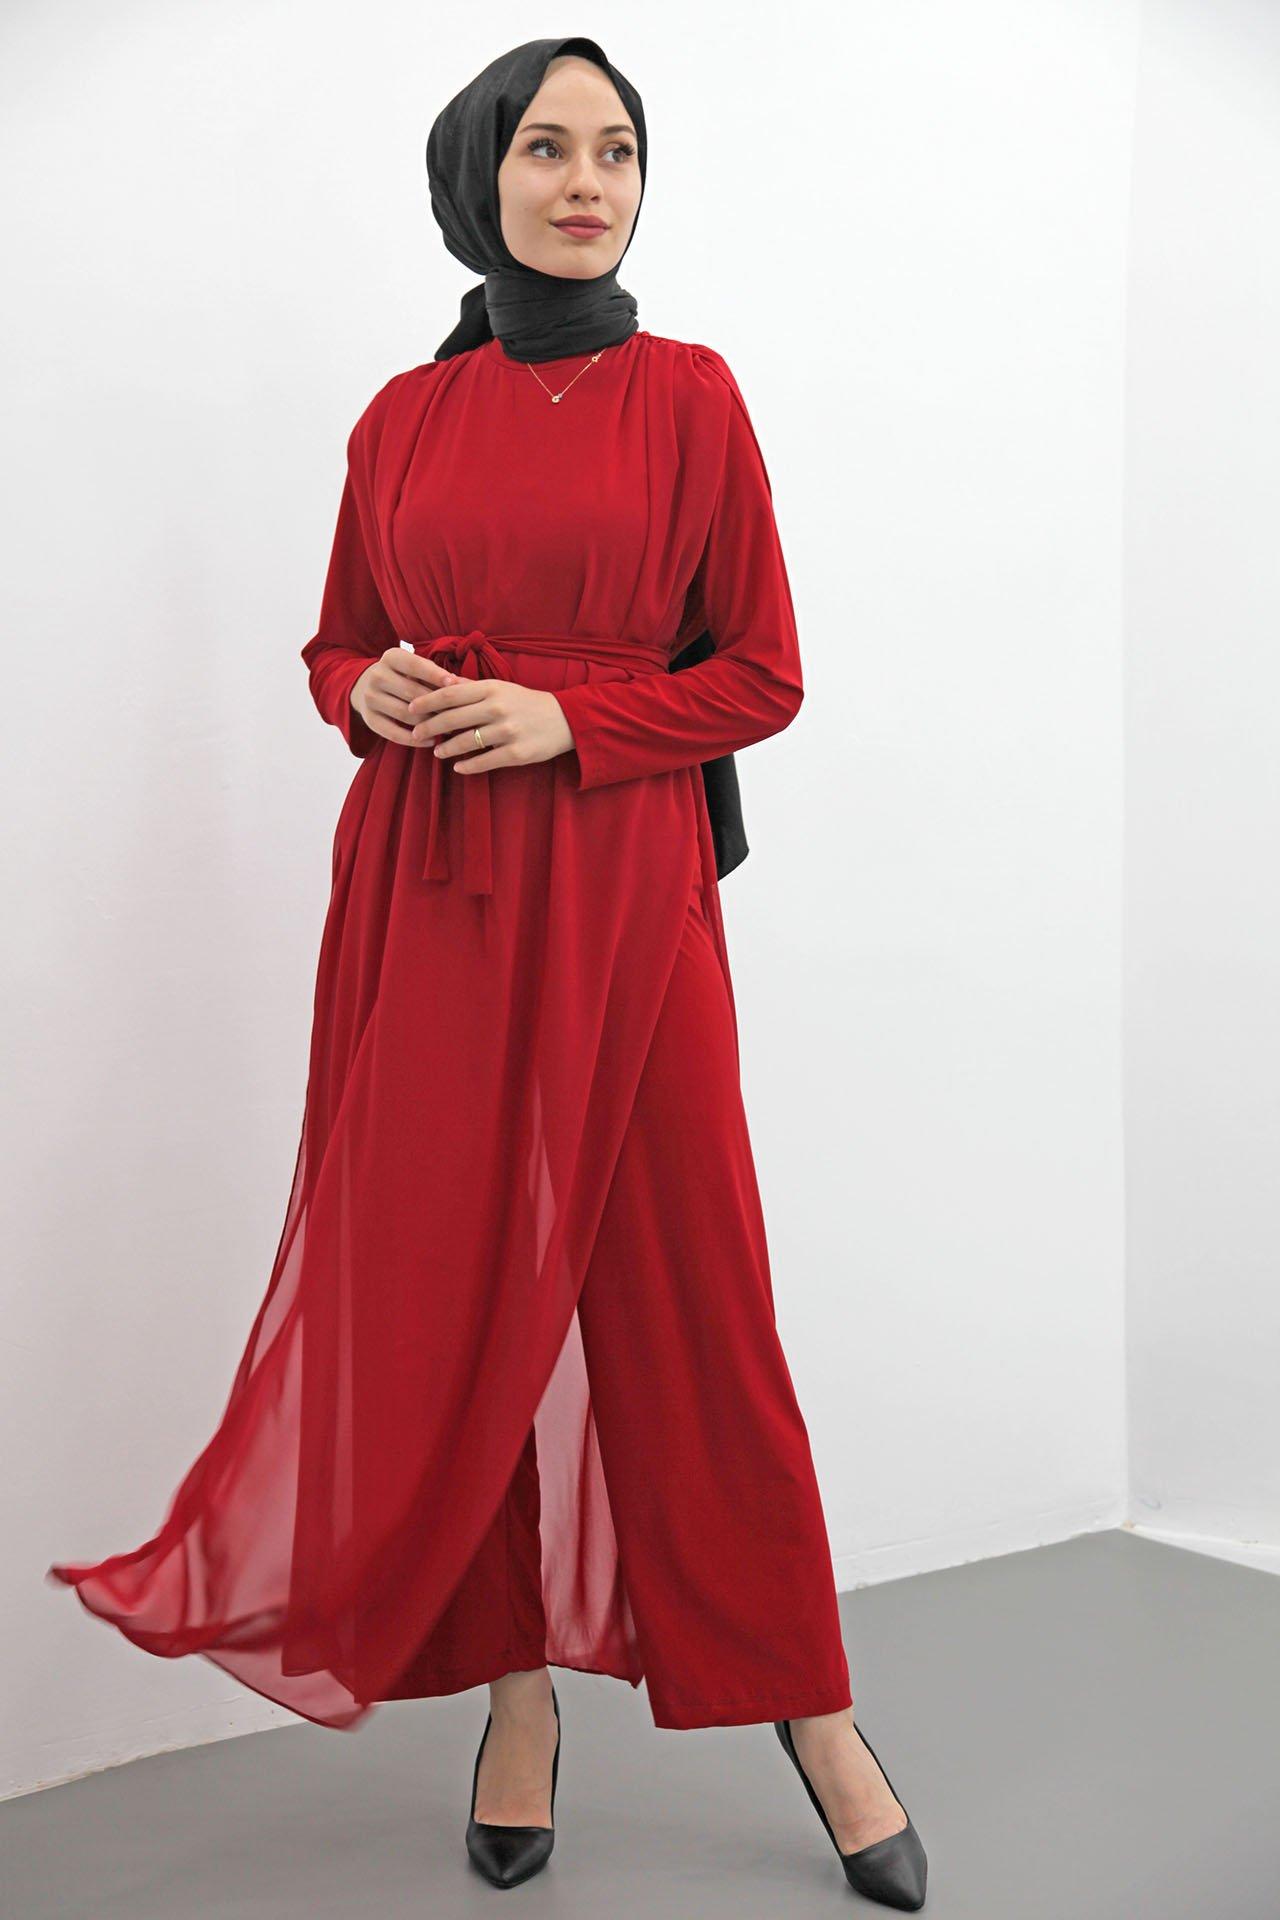 GİZAGİYİM - Kuşaklı Şifon Tulum Kırmızı